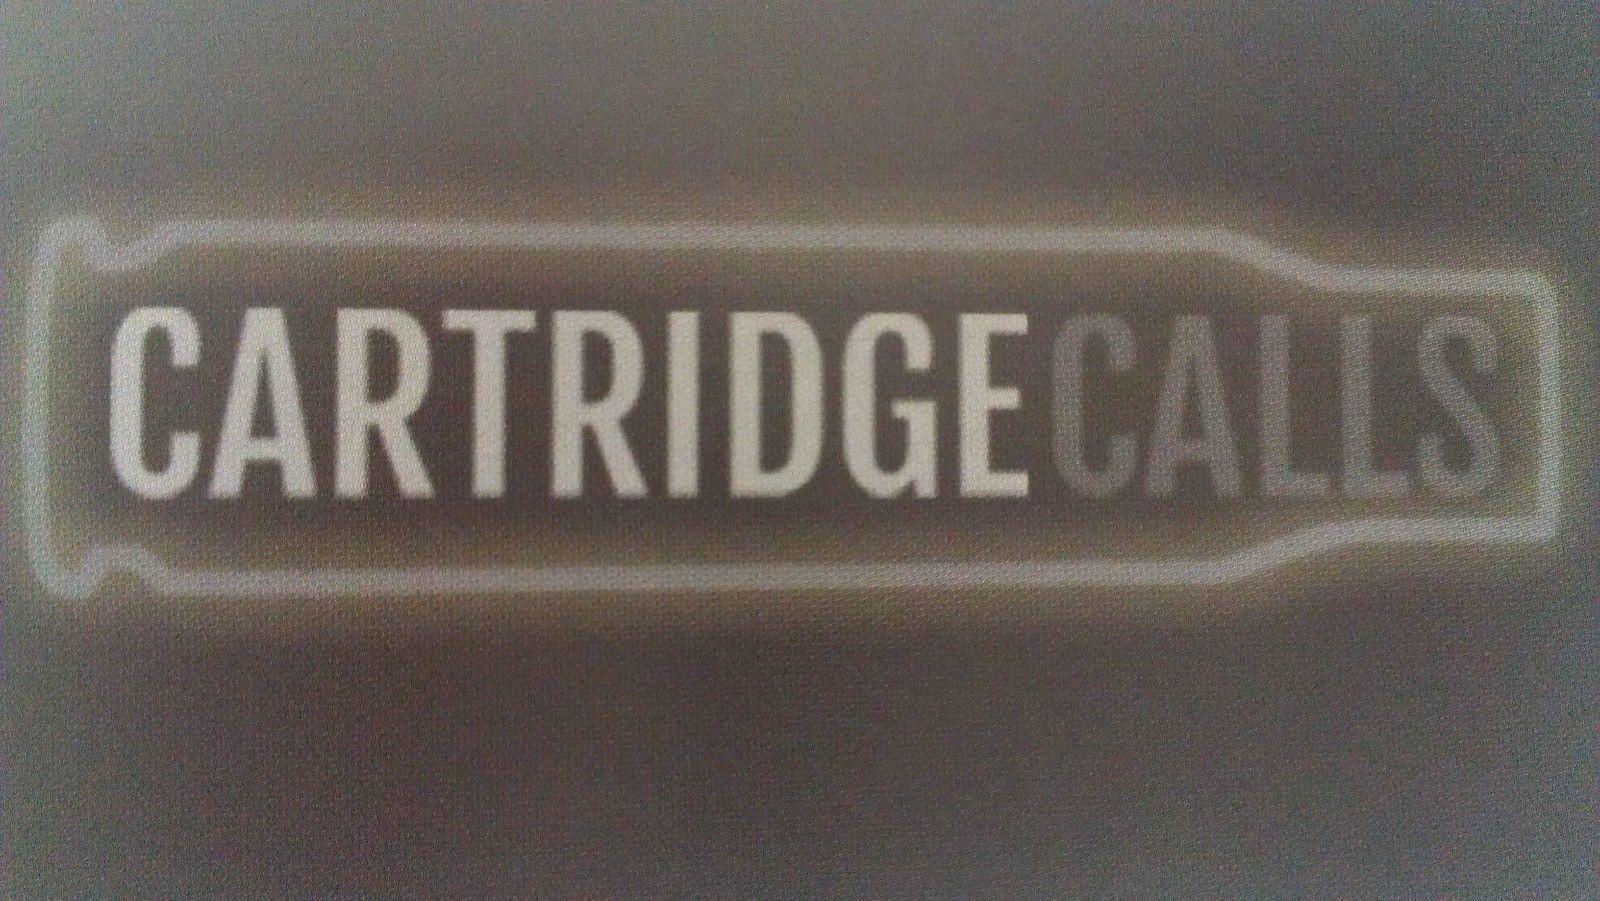 Cartridge Calls